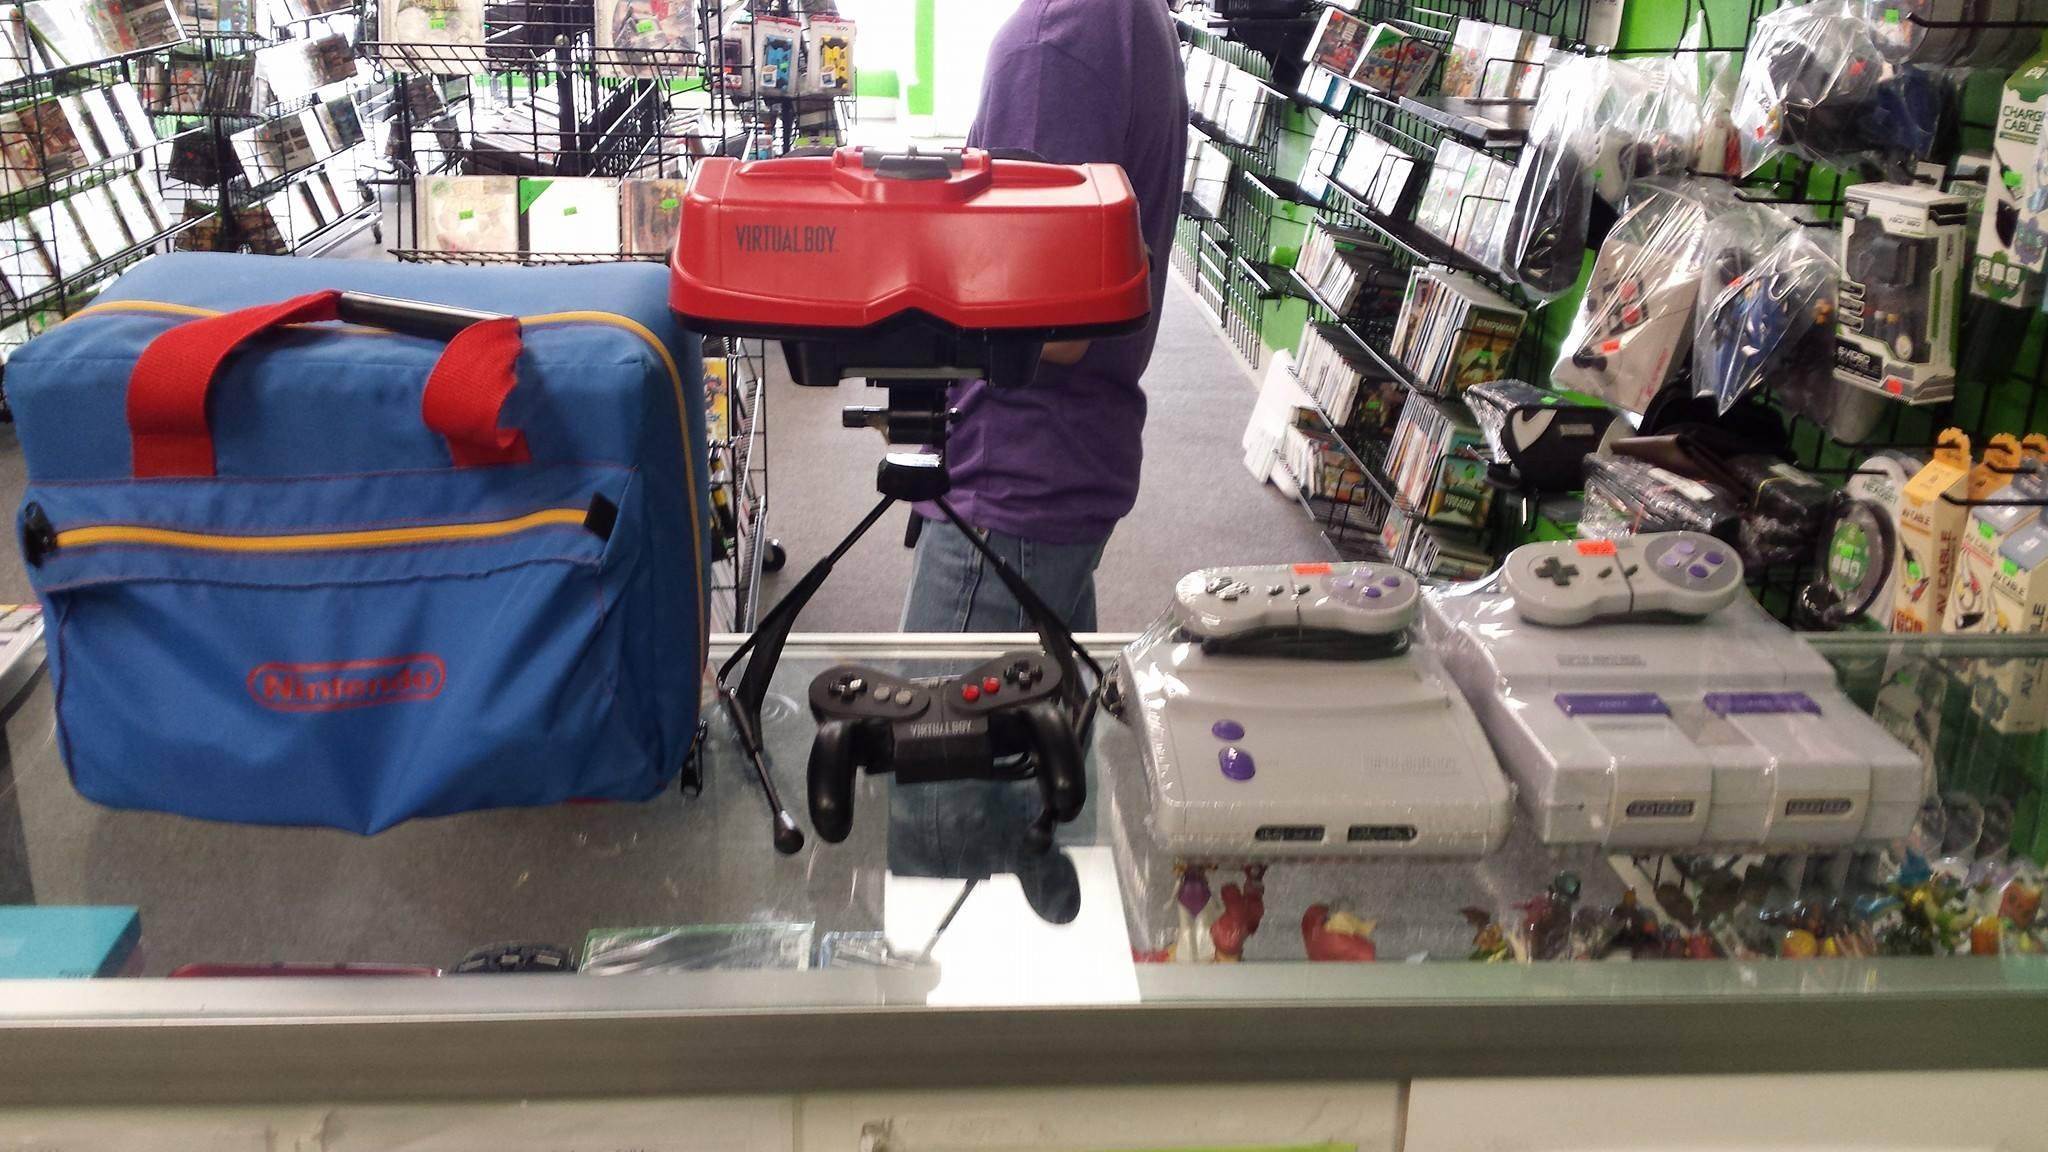 Nintendo Virtual Boy in Store